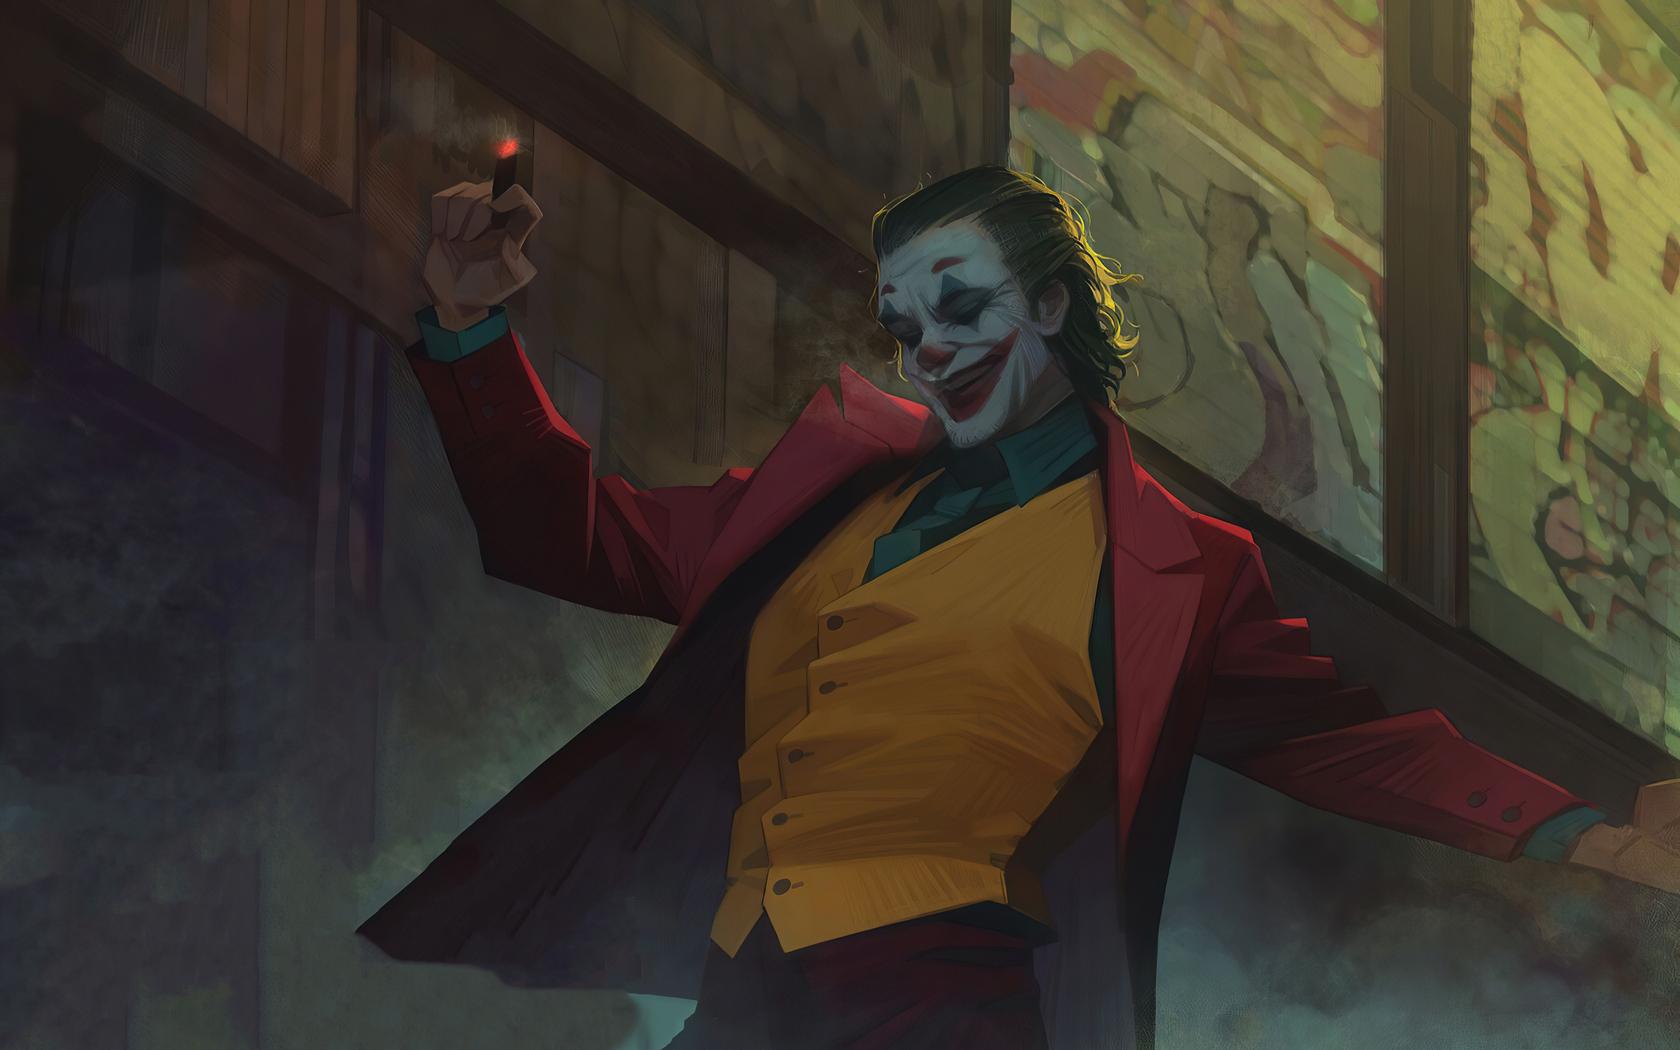 joker-stairs-dance-2020-4e.jpg